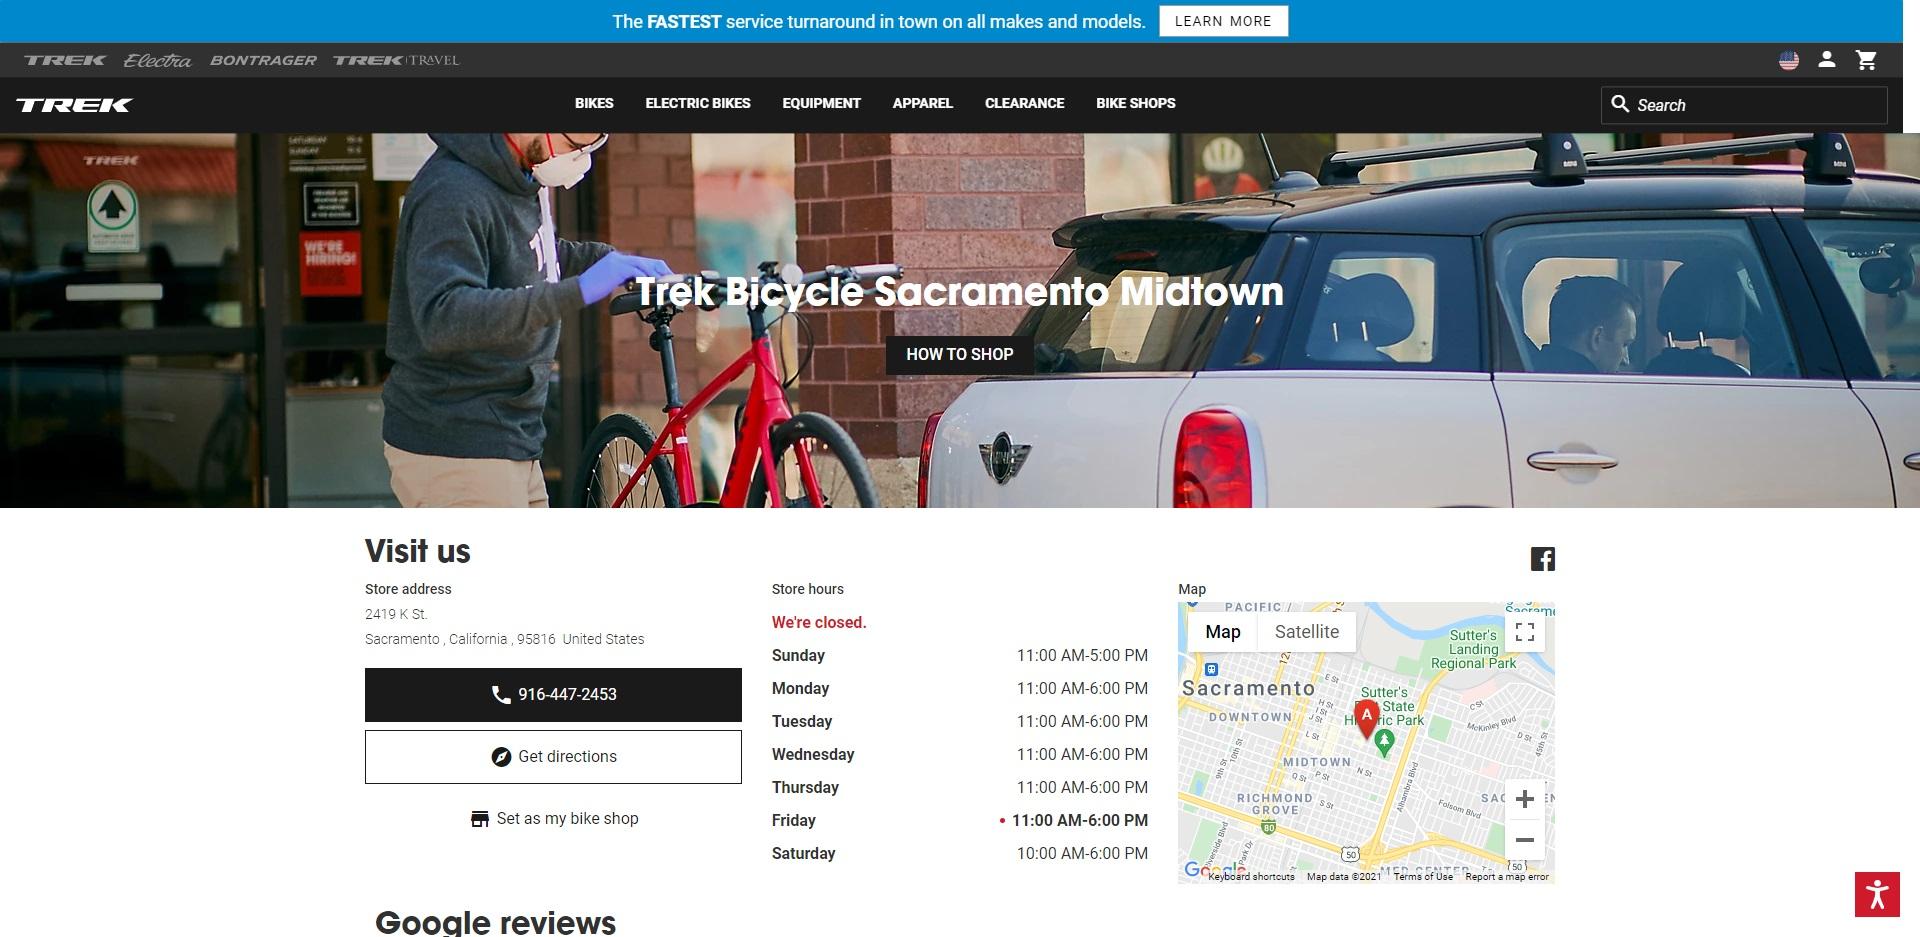 The Best Bike Shops in Sacramento, CA